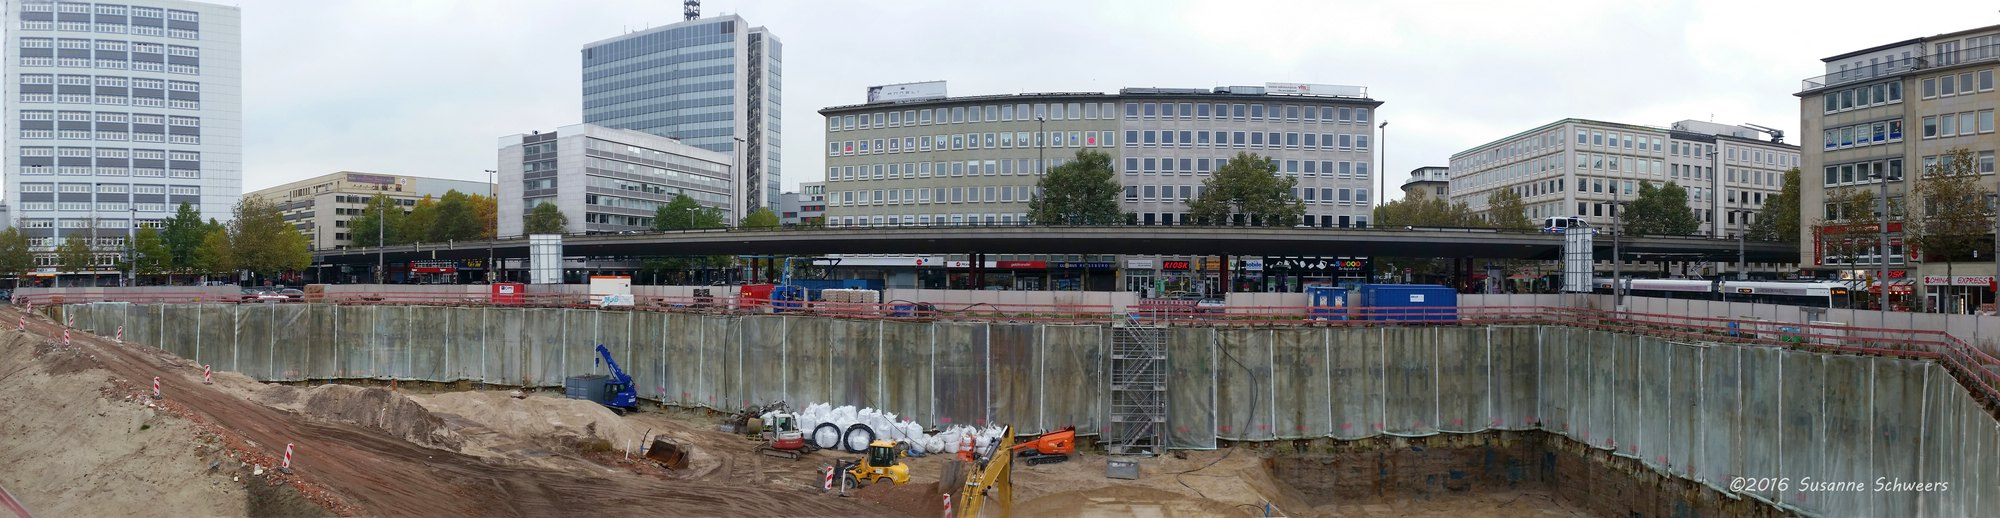 Baustelle Bahnhofsplatz 77